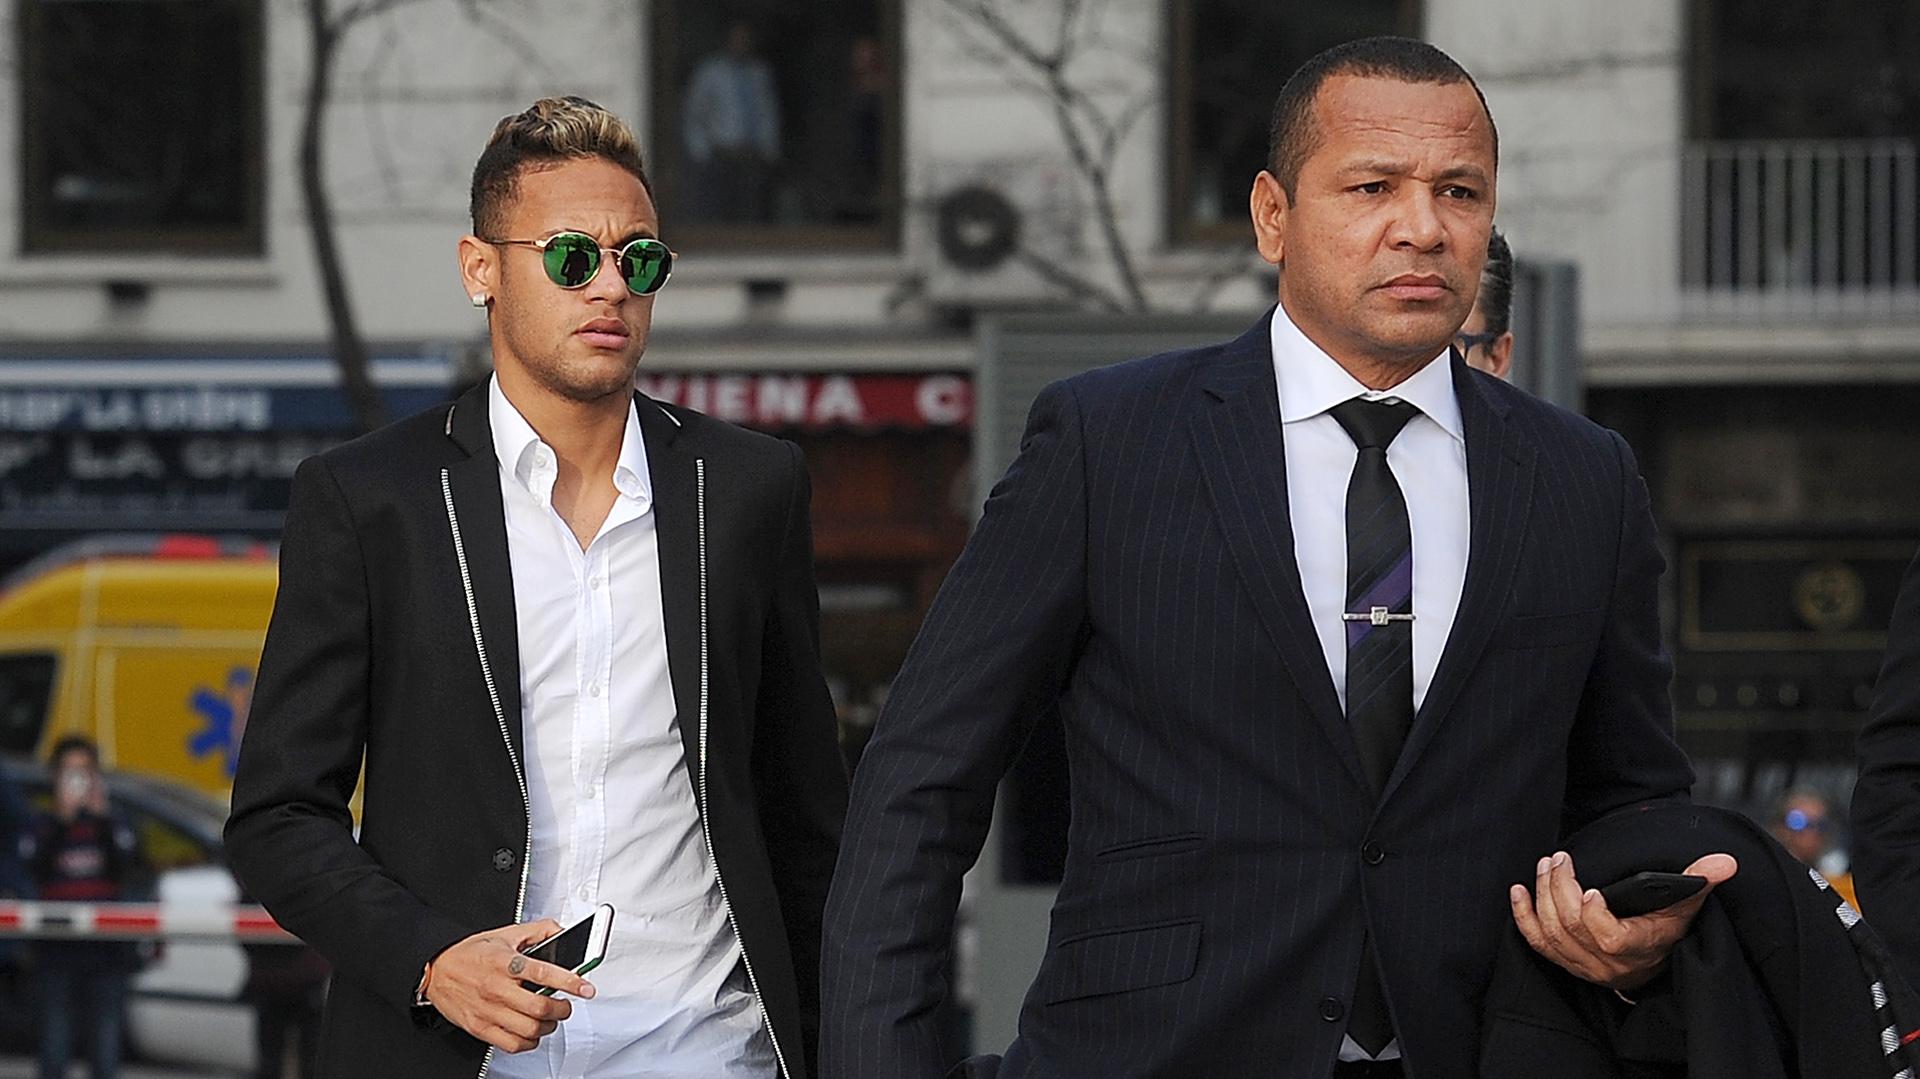 El padre de Neymar motivó el fichaje por el Paris Saint Germain (Getty Images)